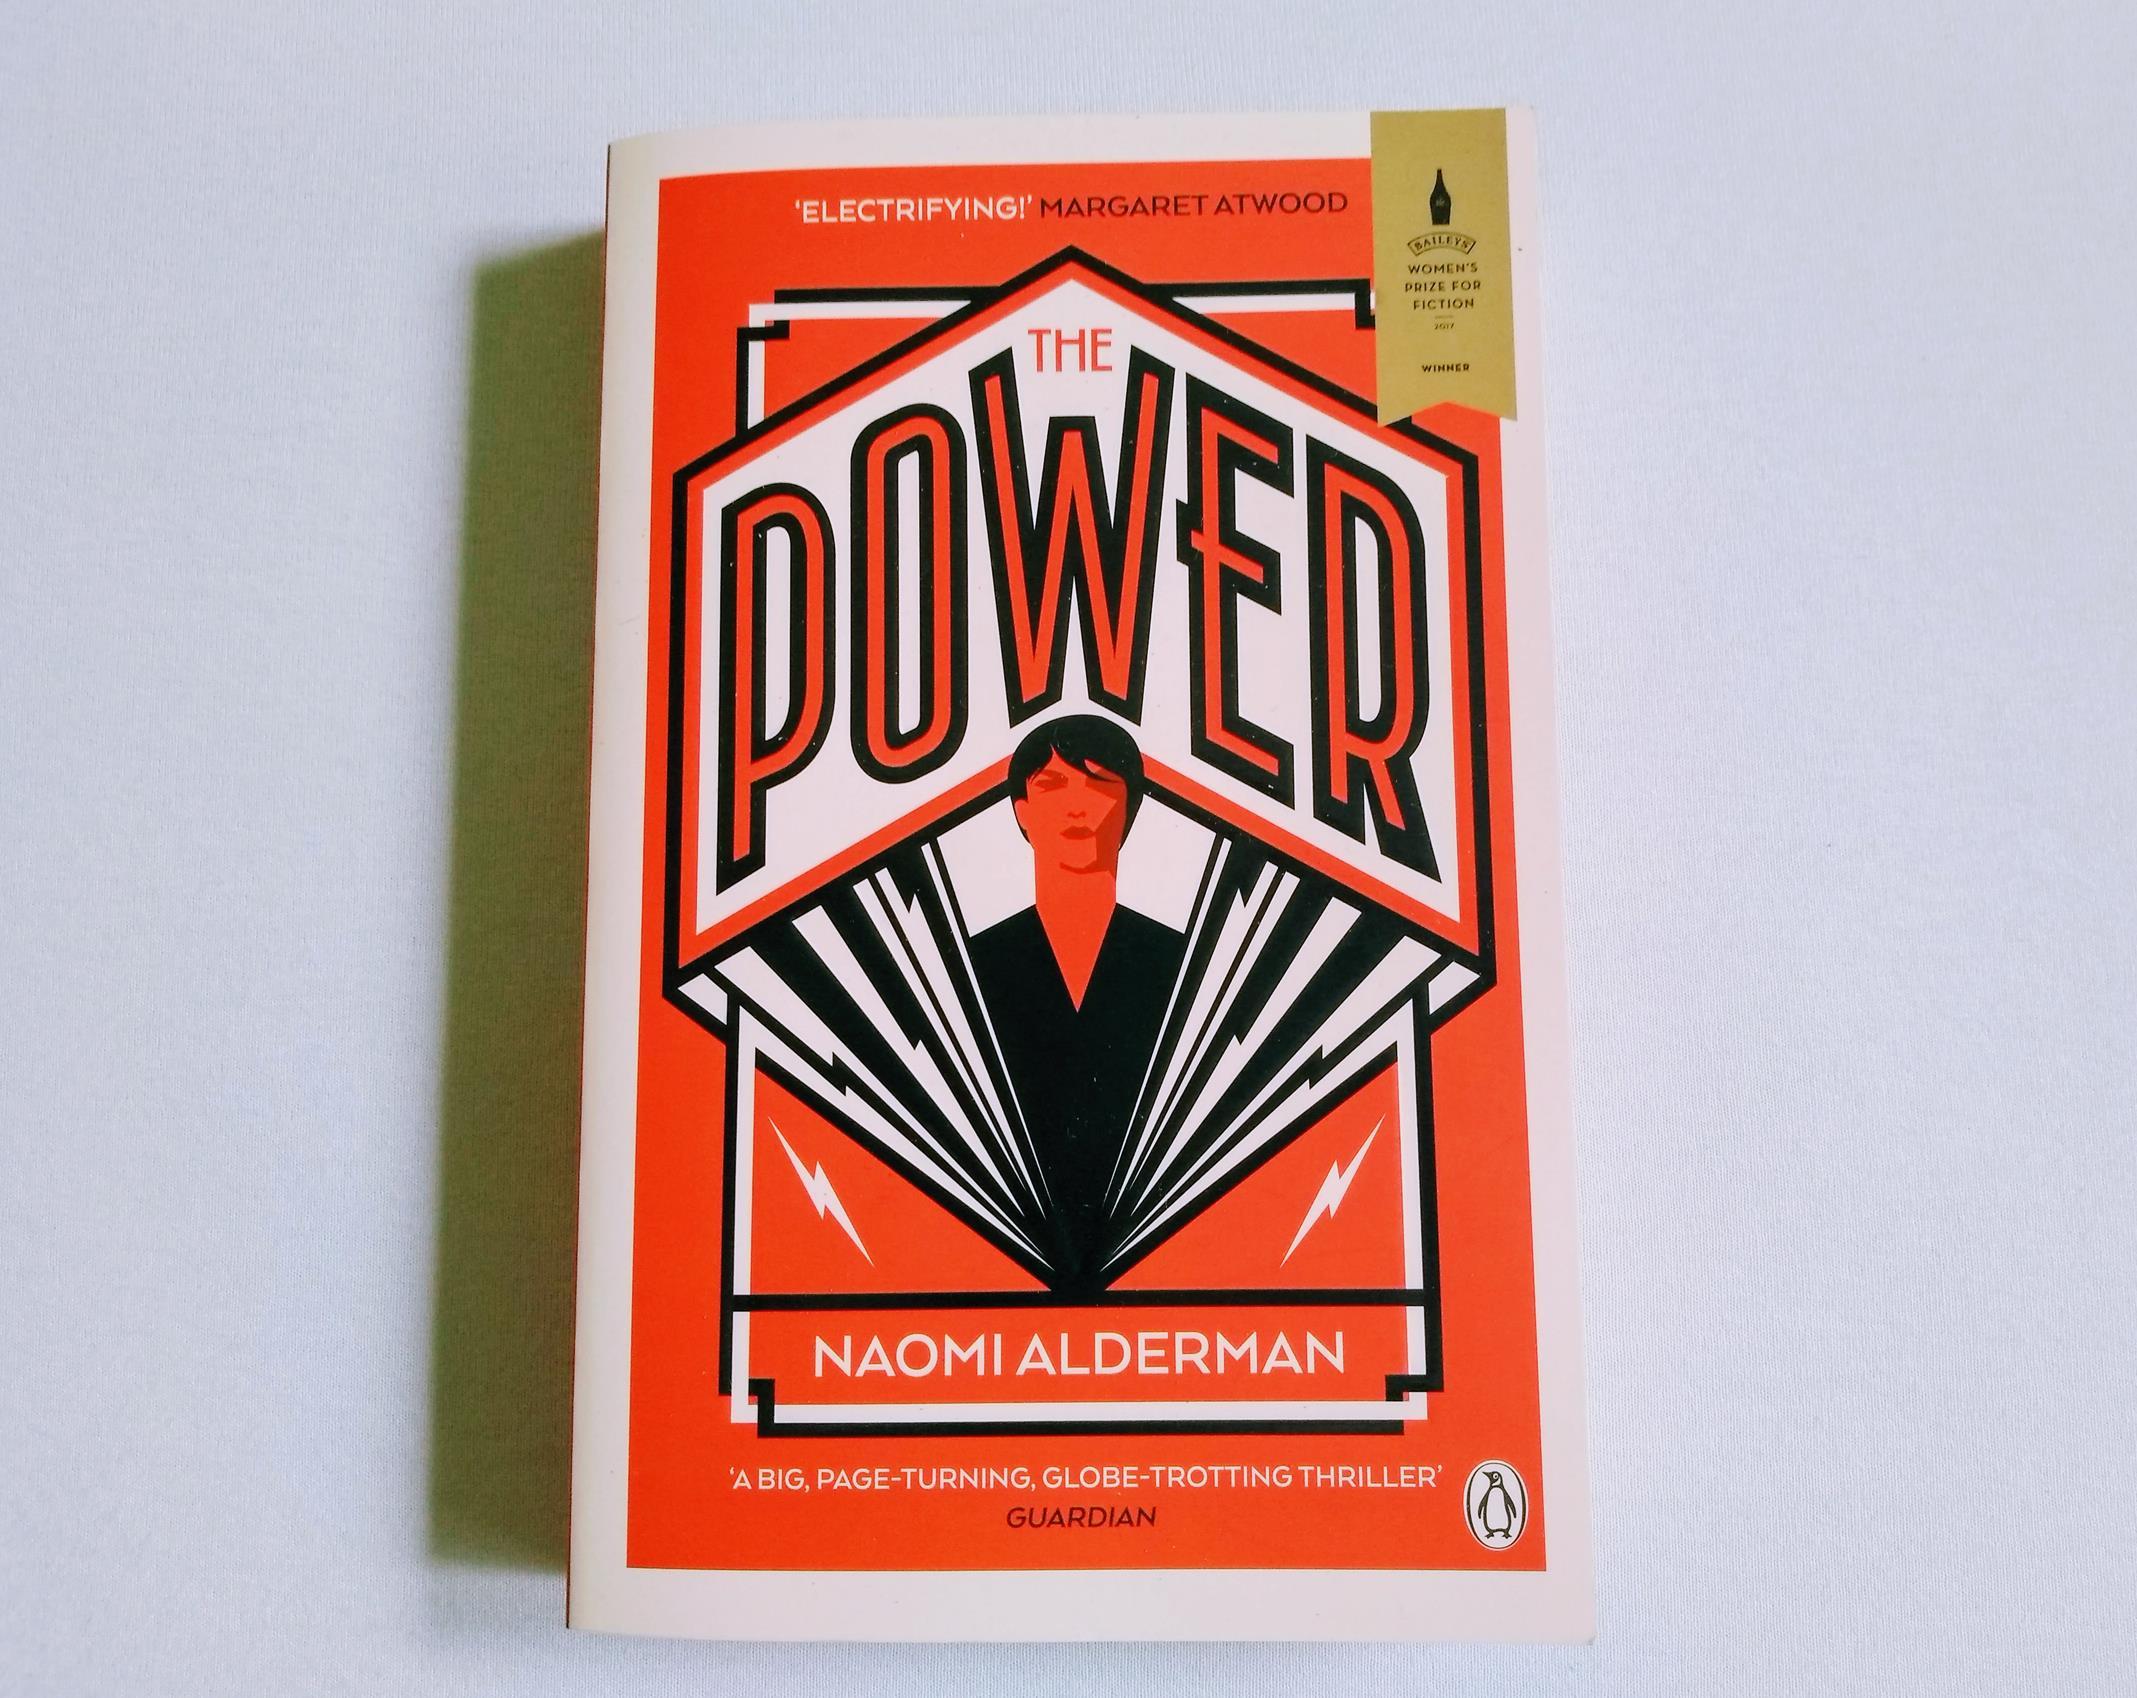 The Power_Naomi Alderman